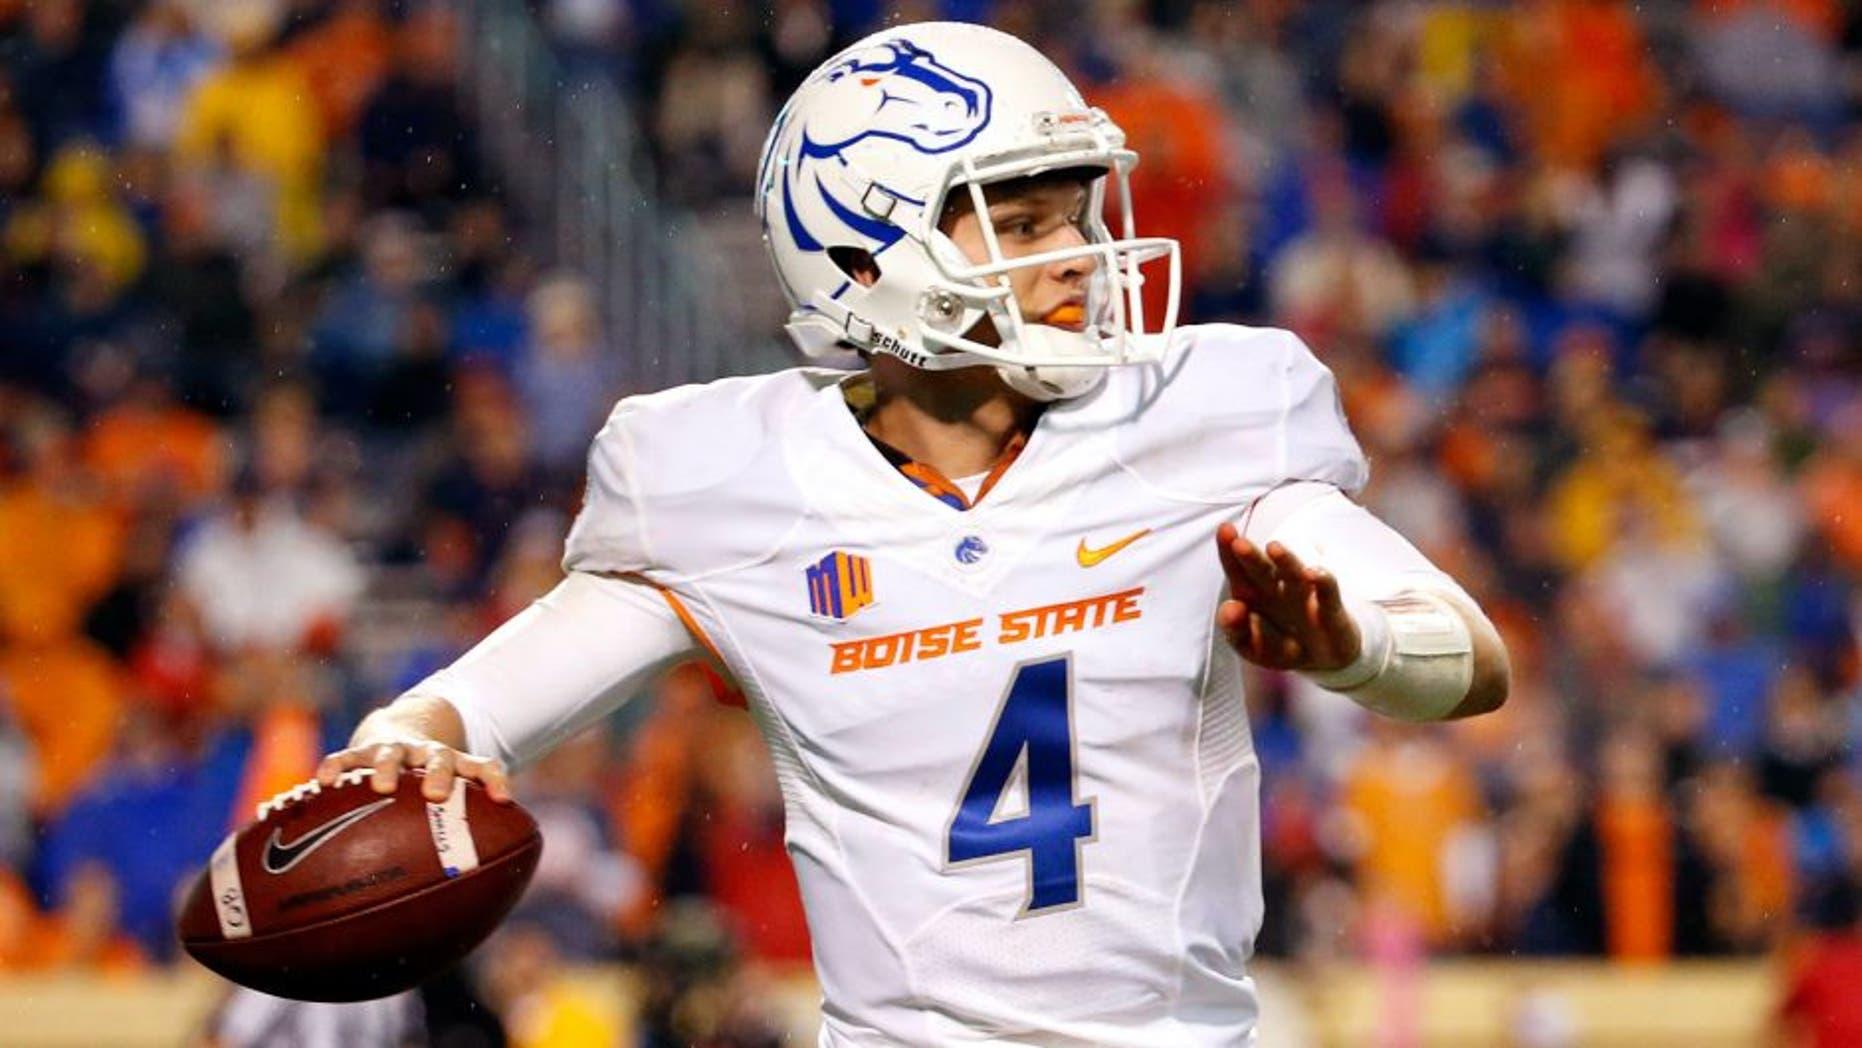 Sep 25, 2015; Charlottesville, VA, USA; Boise State Broncos quarterback Brett Rypien (4) throws the ball against the Virginia Cavaliers in the third quarter at Scott Stadium. Mandatory Credit: Amber Searls-USA TODAY Sports